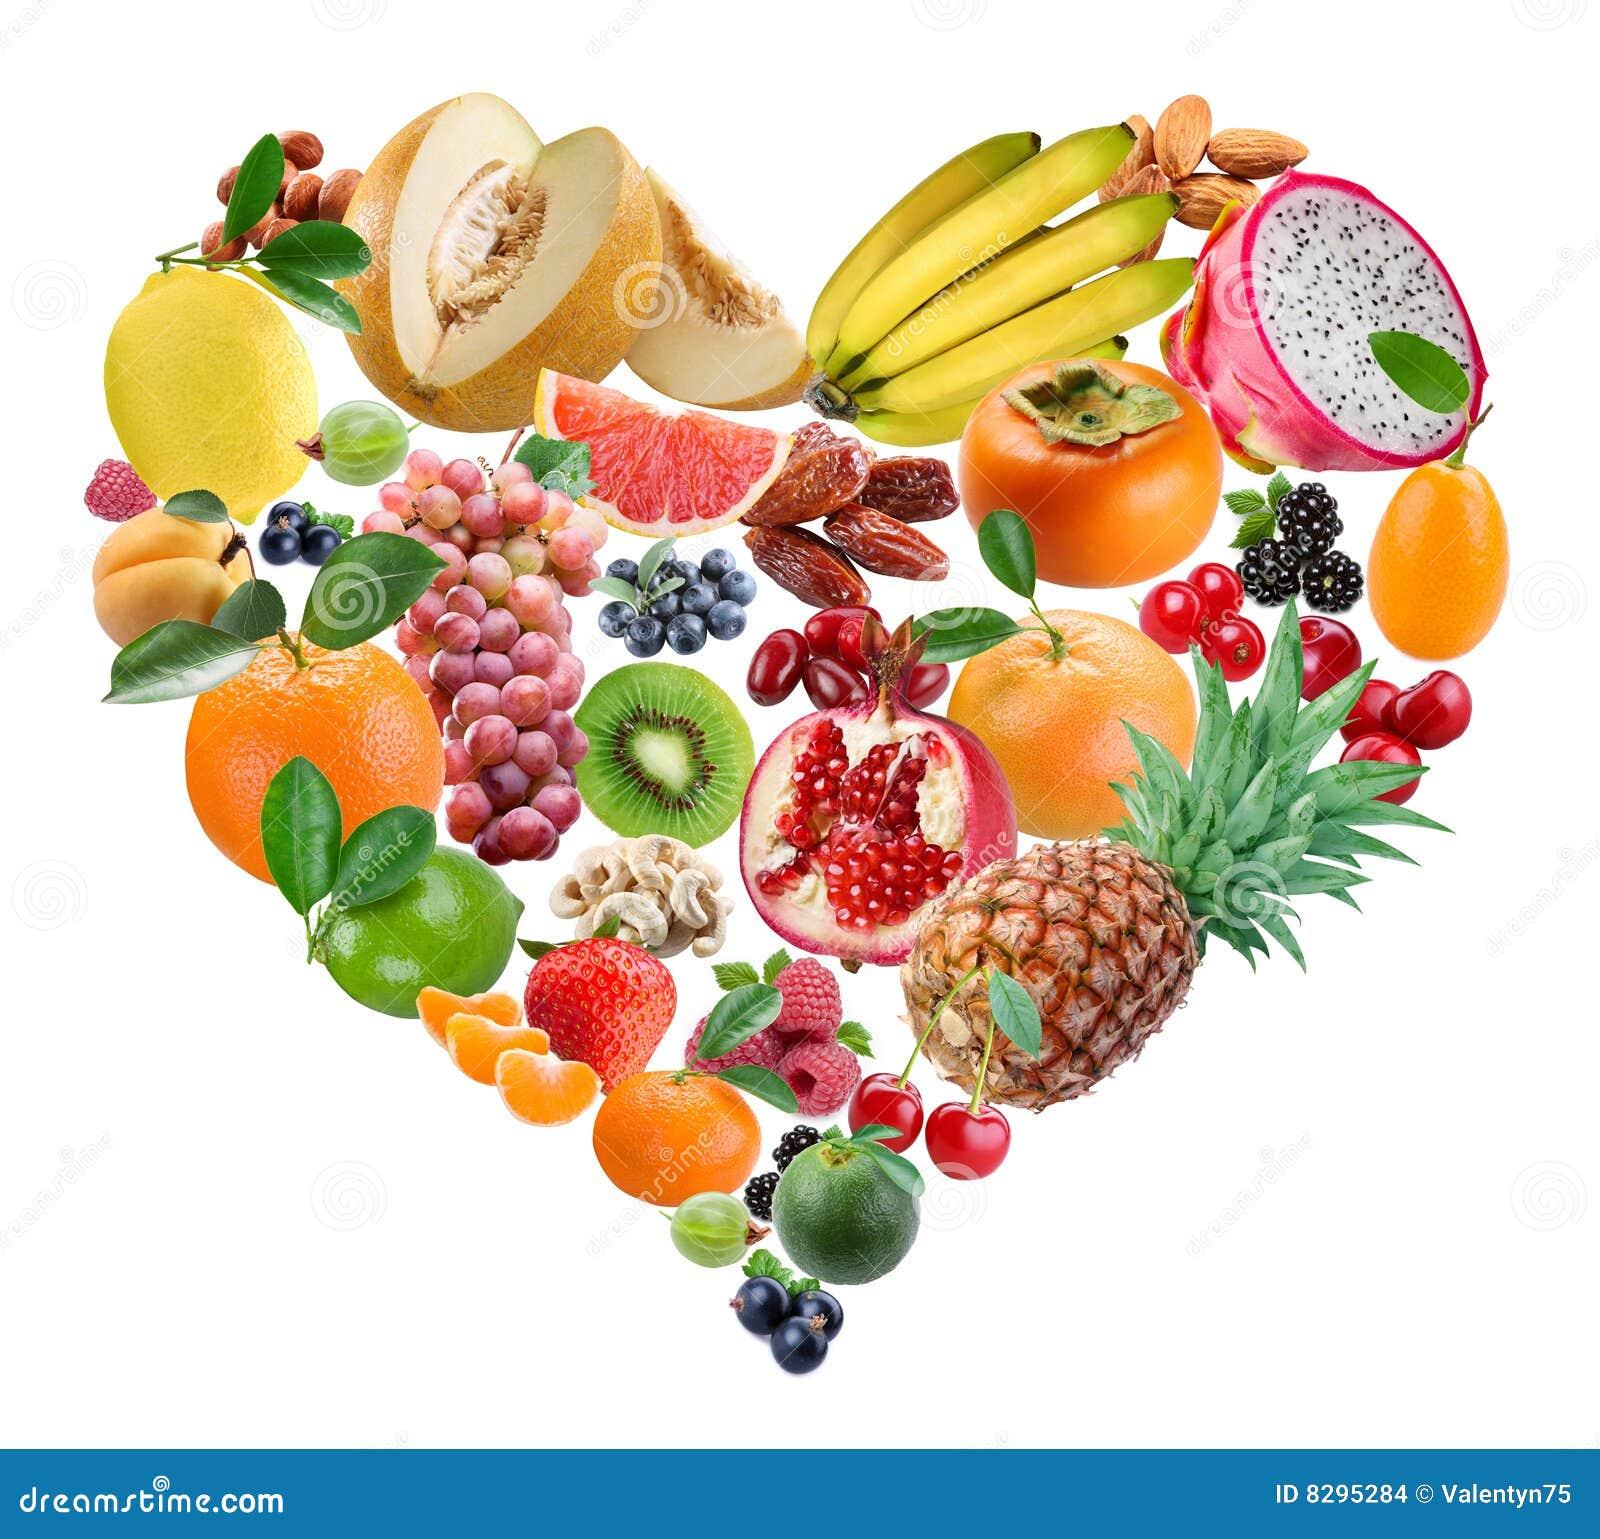 Heart fruits